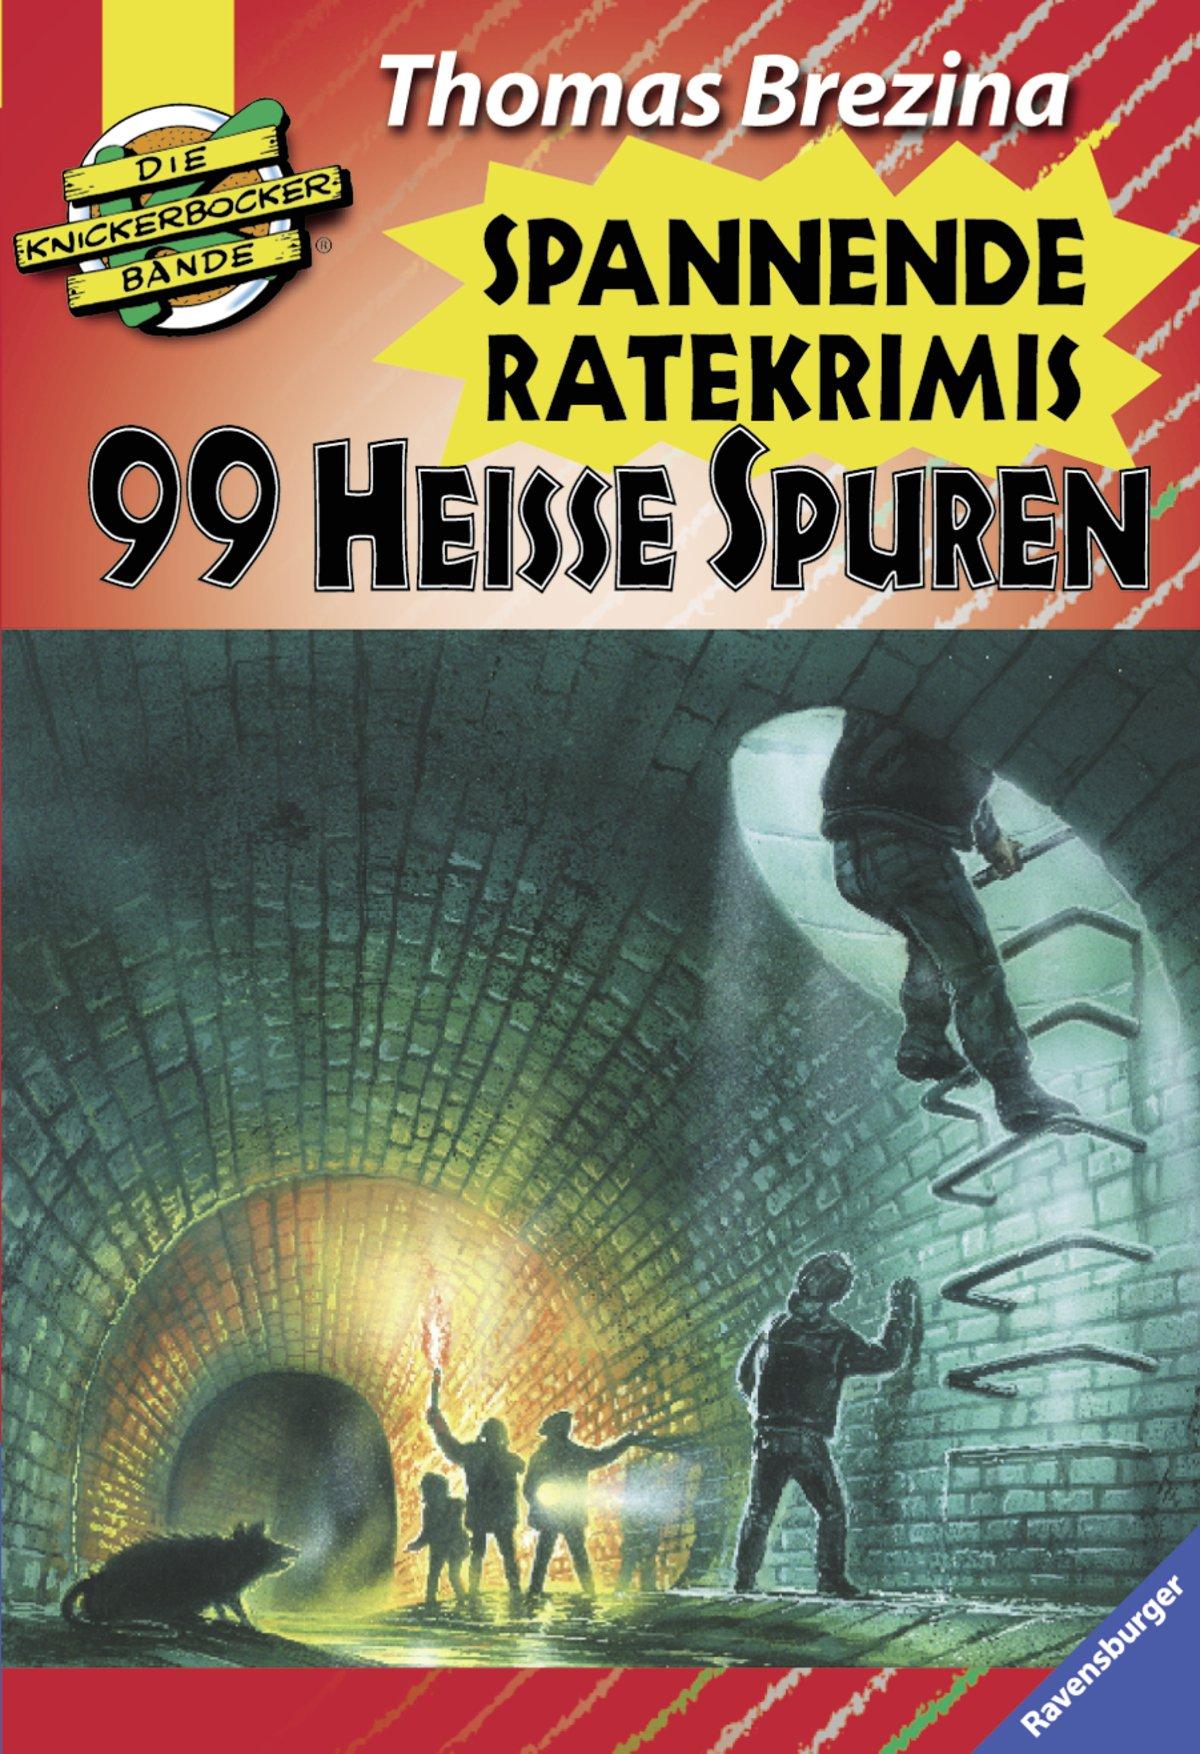 99 heiße Spuren: Spannende Ratekrimis (Die Knickerbocker-Bande - Sonderbände)